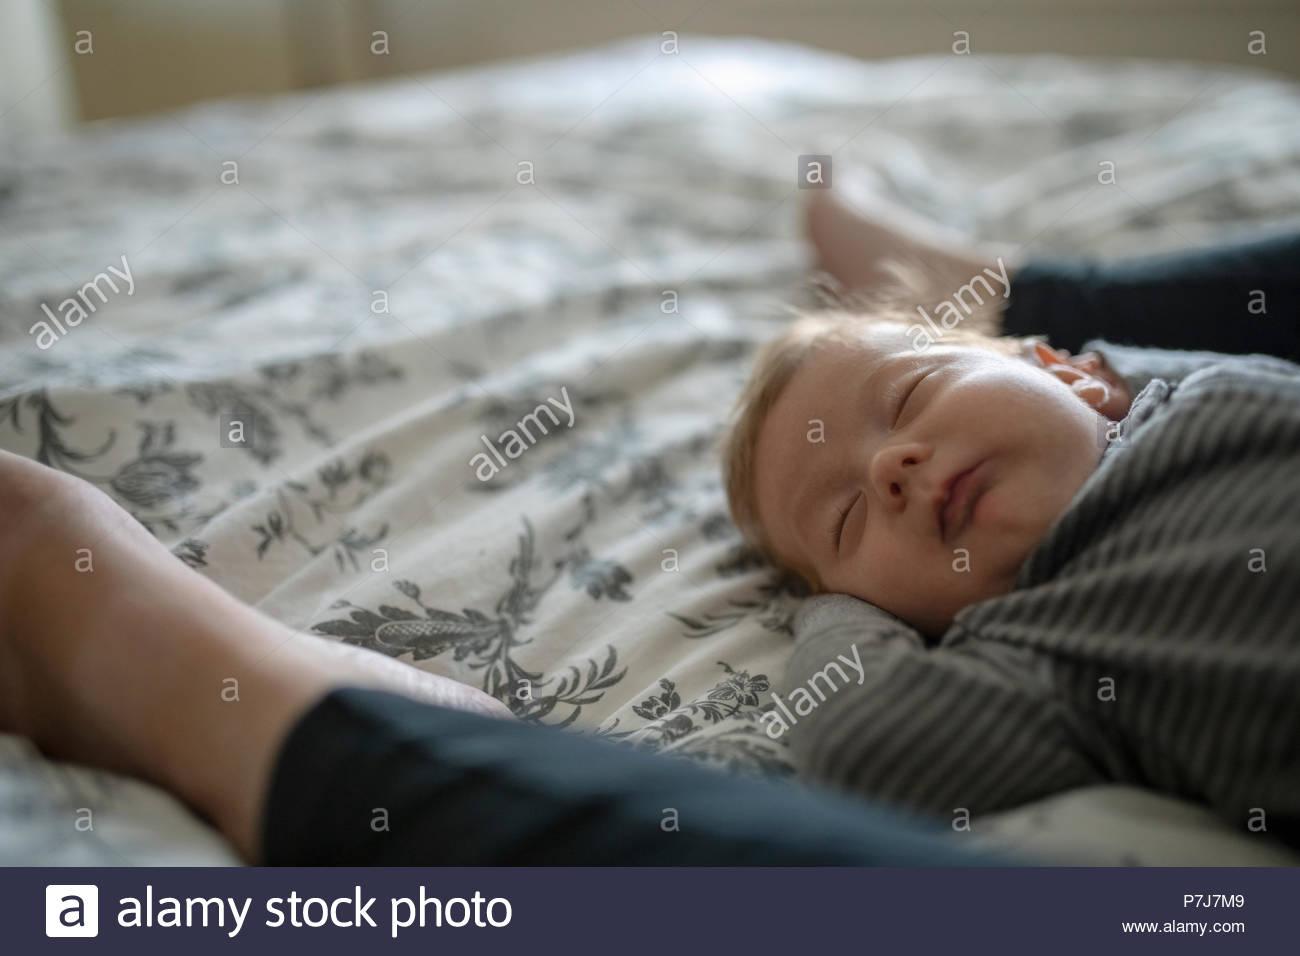 Serene baby boy sleeping between mothers legs on bed - Stock Image